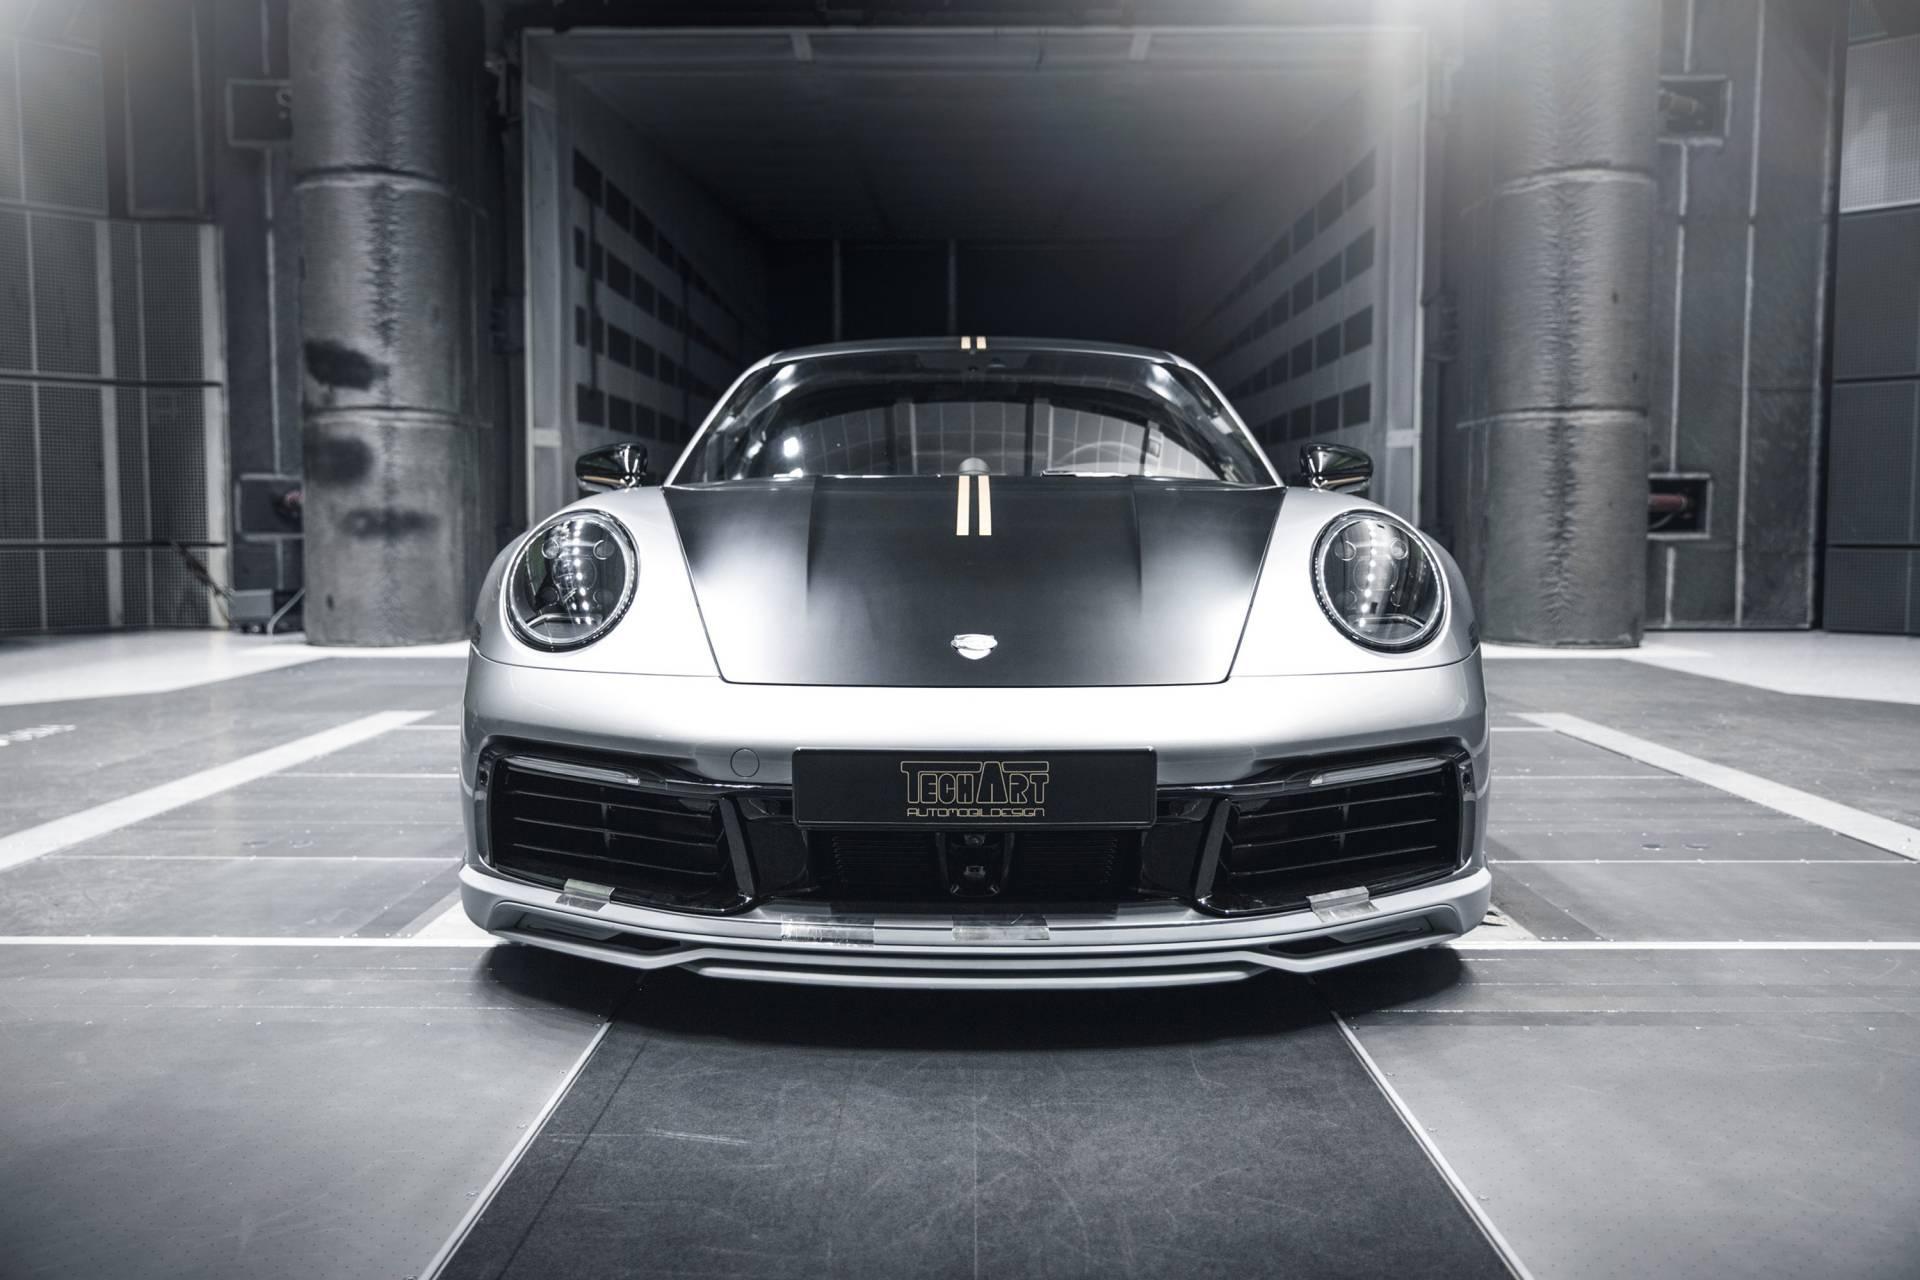 Chi tiet Porsche 911 2020 lot xac man nhan voi goi do thu cong hinh anh 2